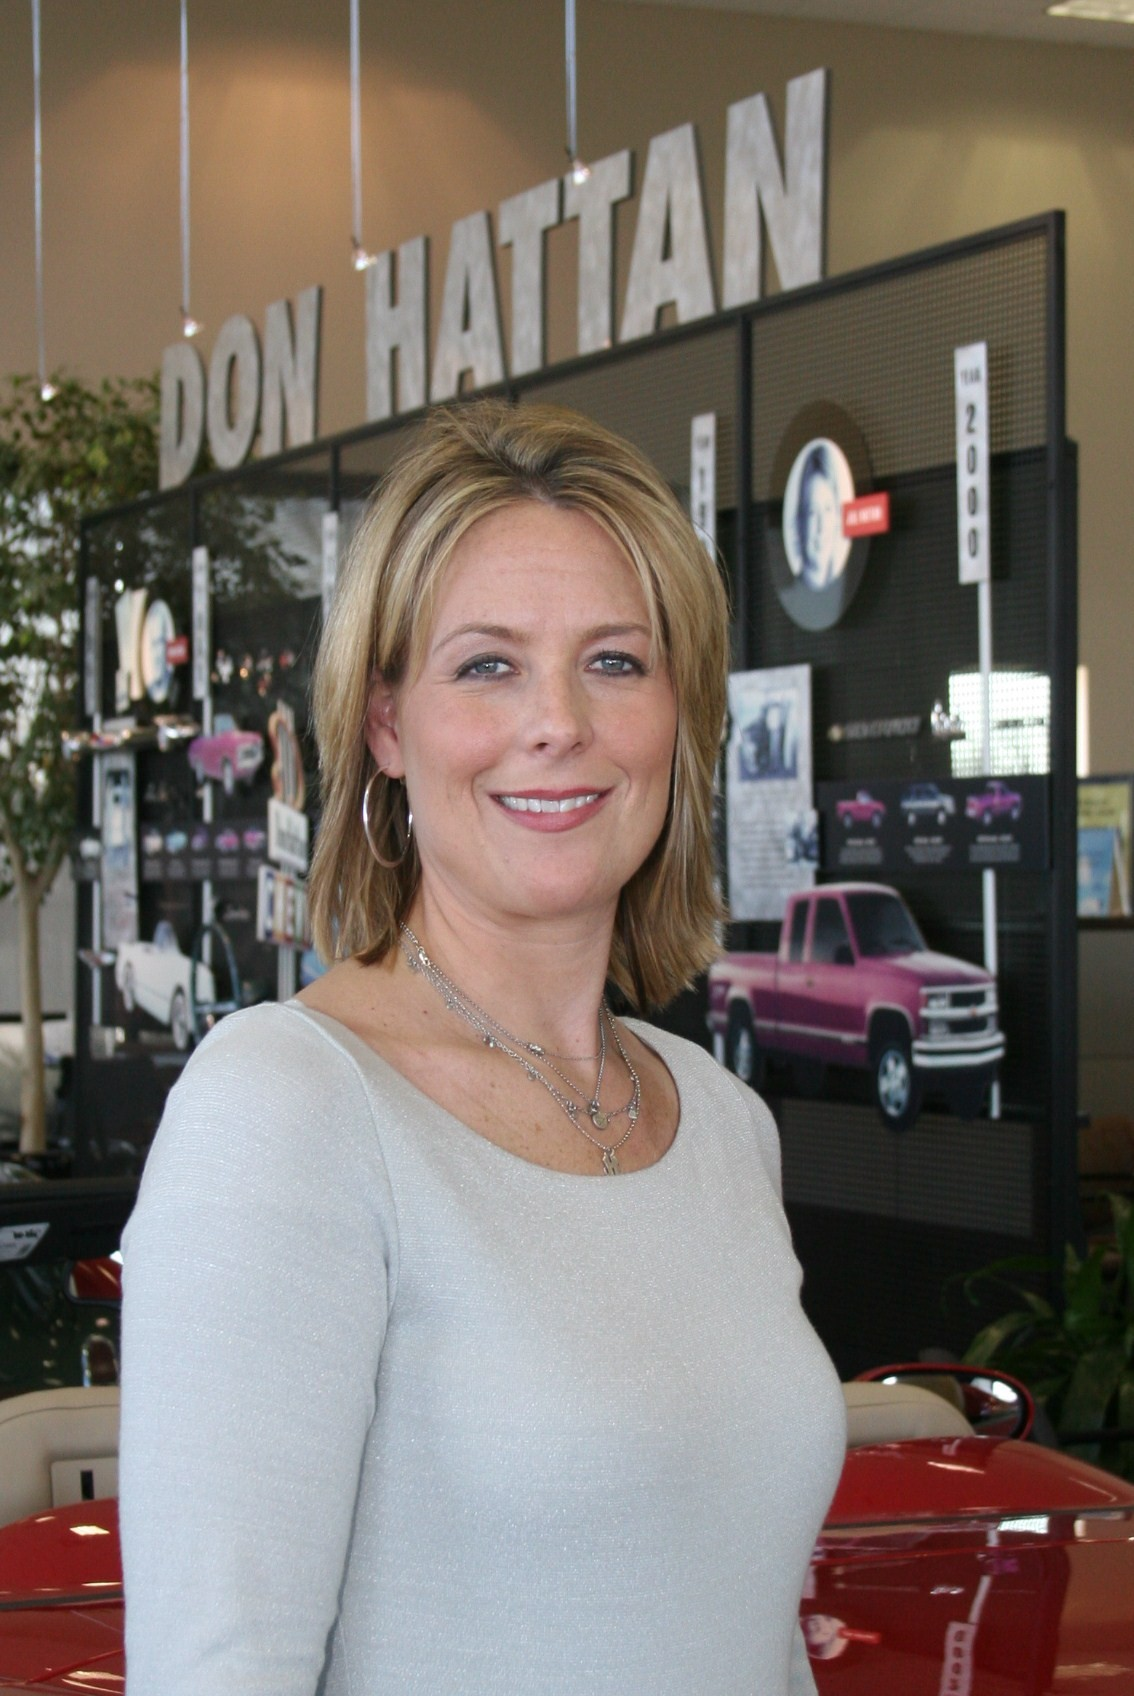 Jill Hattan